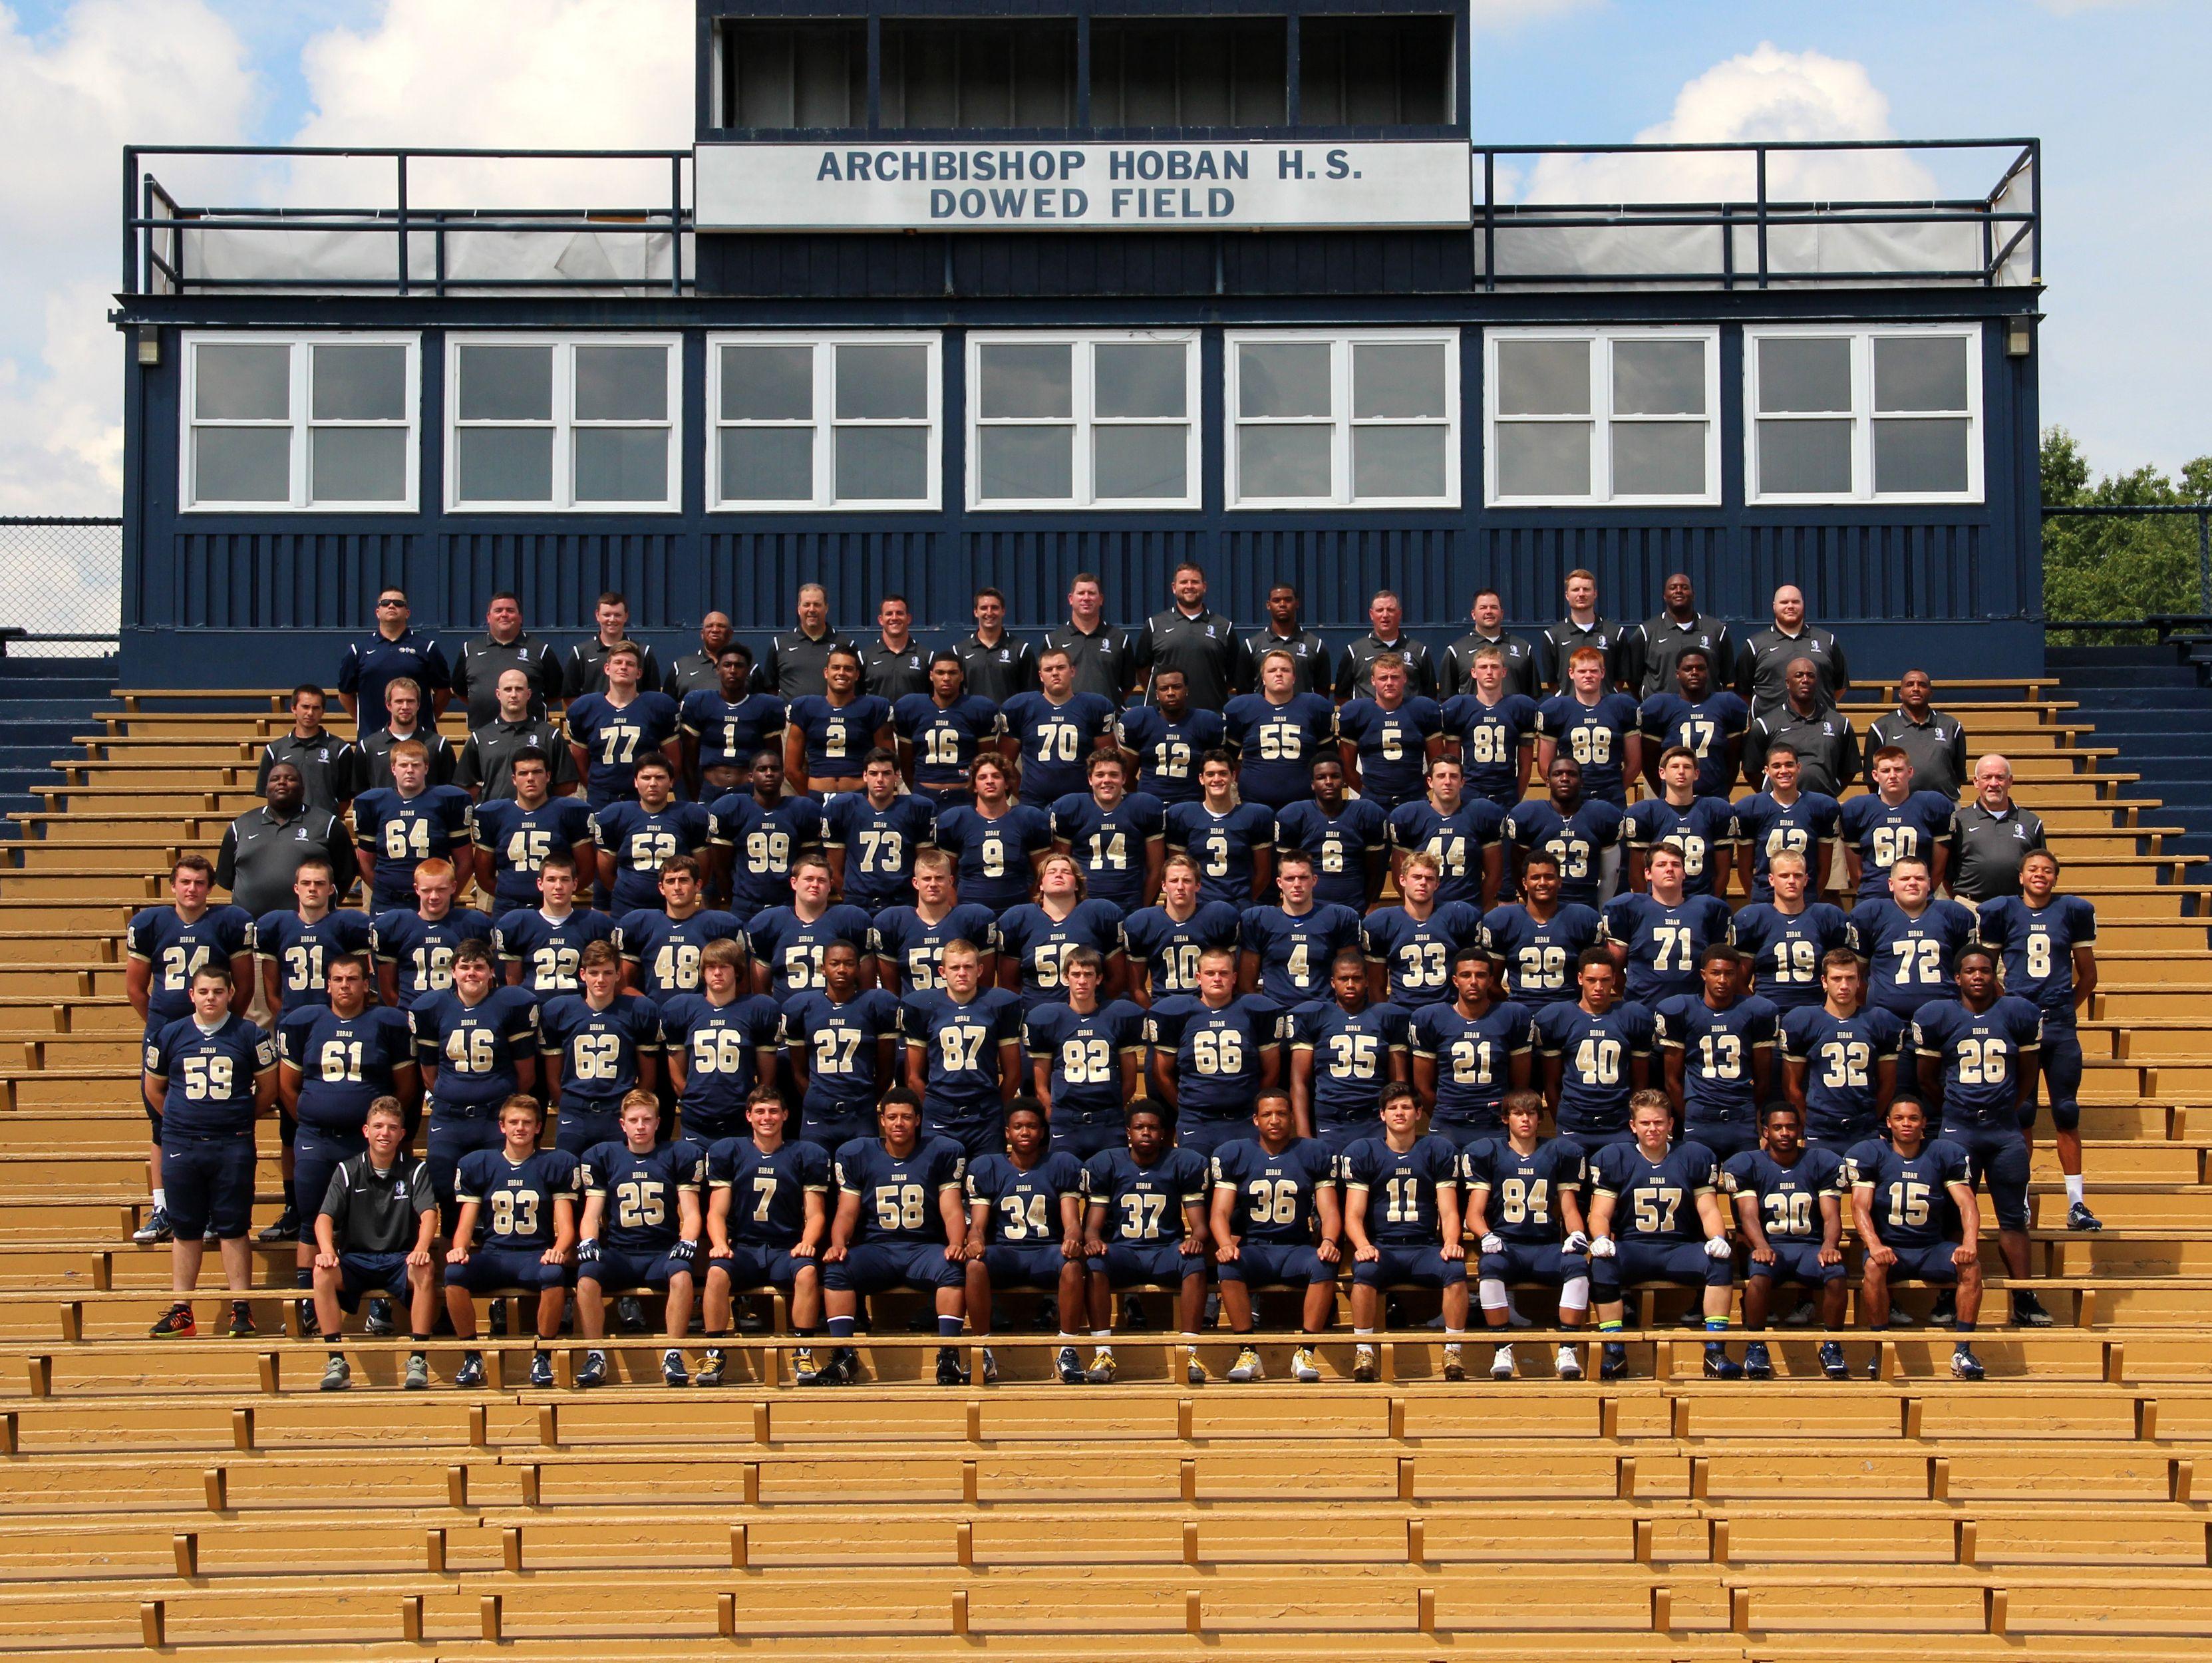 2015 Archbishop Hoban High School varsity football team